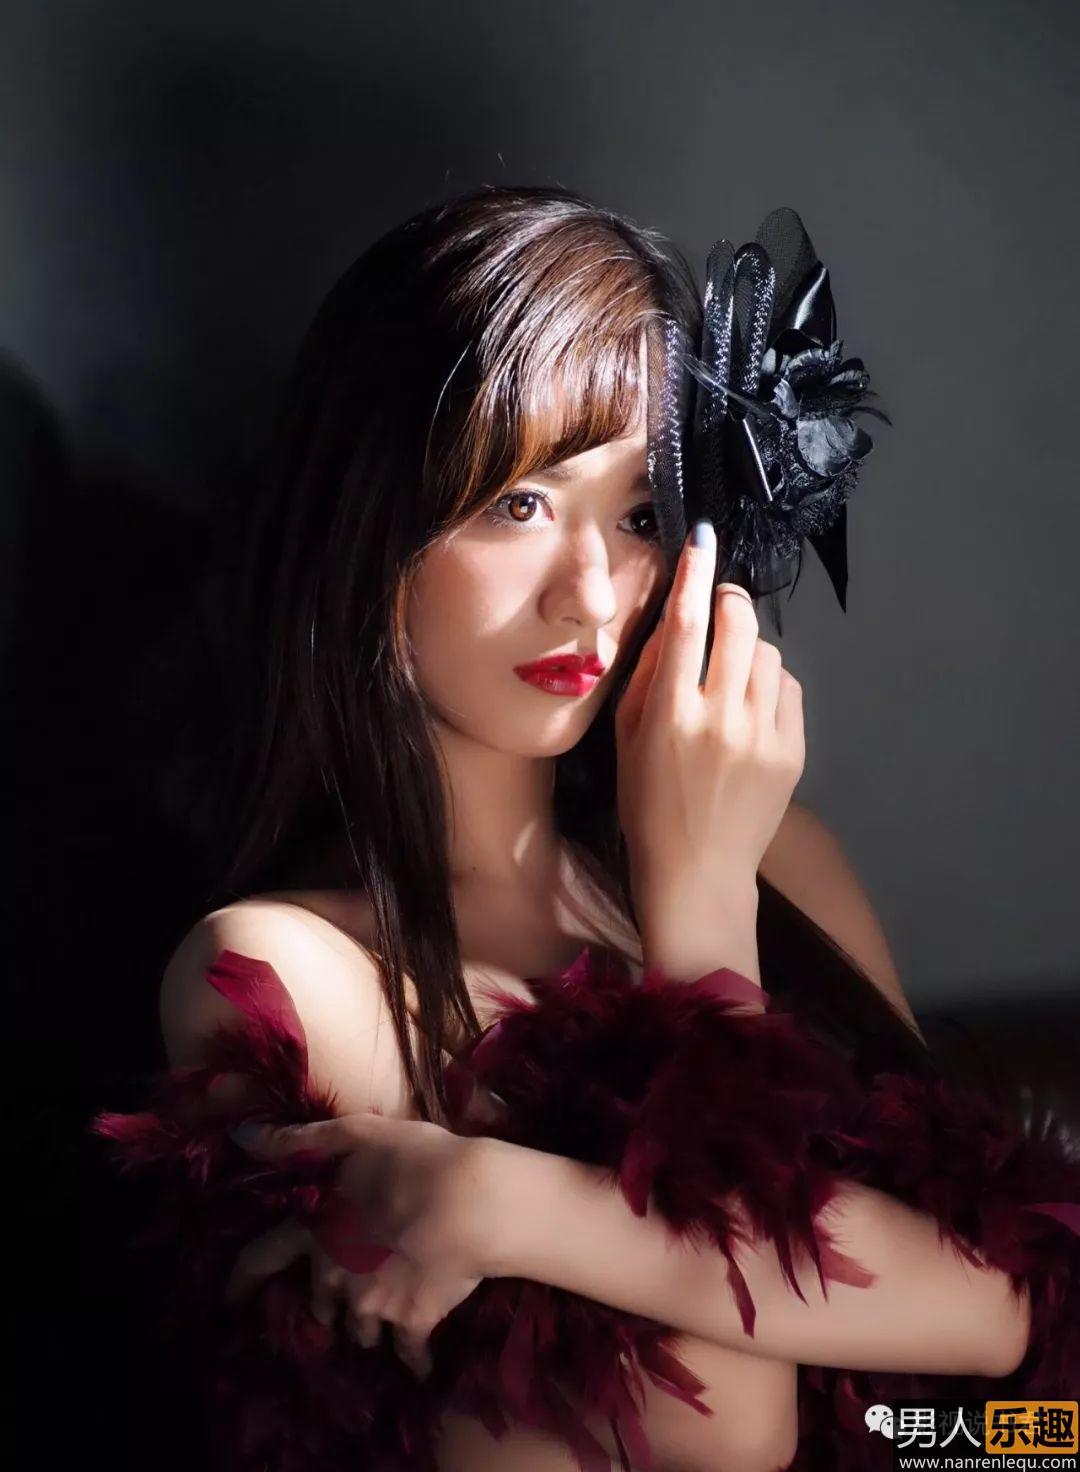 MEYD-616 桐谷まつり(桐谷茉莉)最强童颜爆渣妹